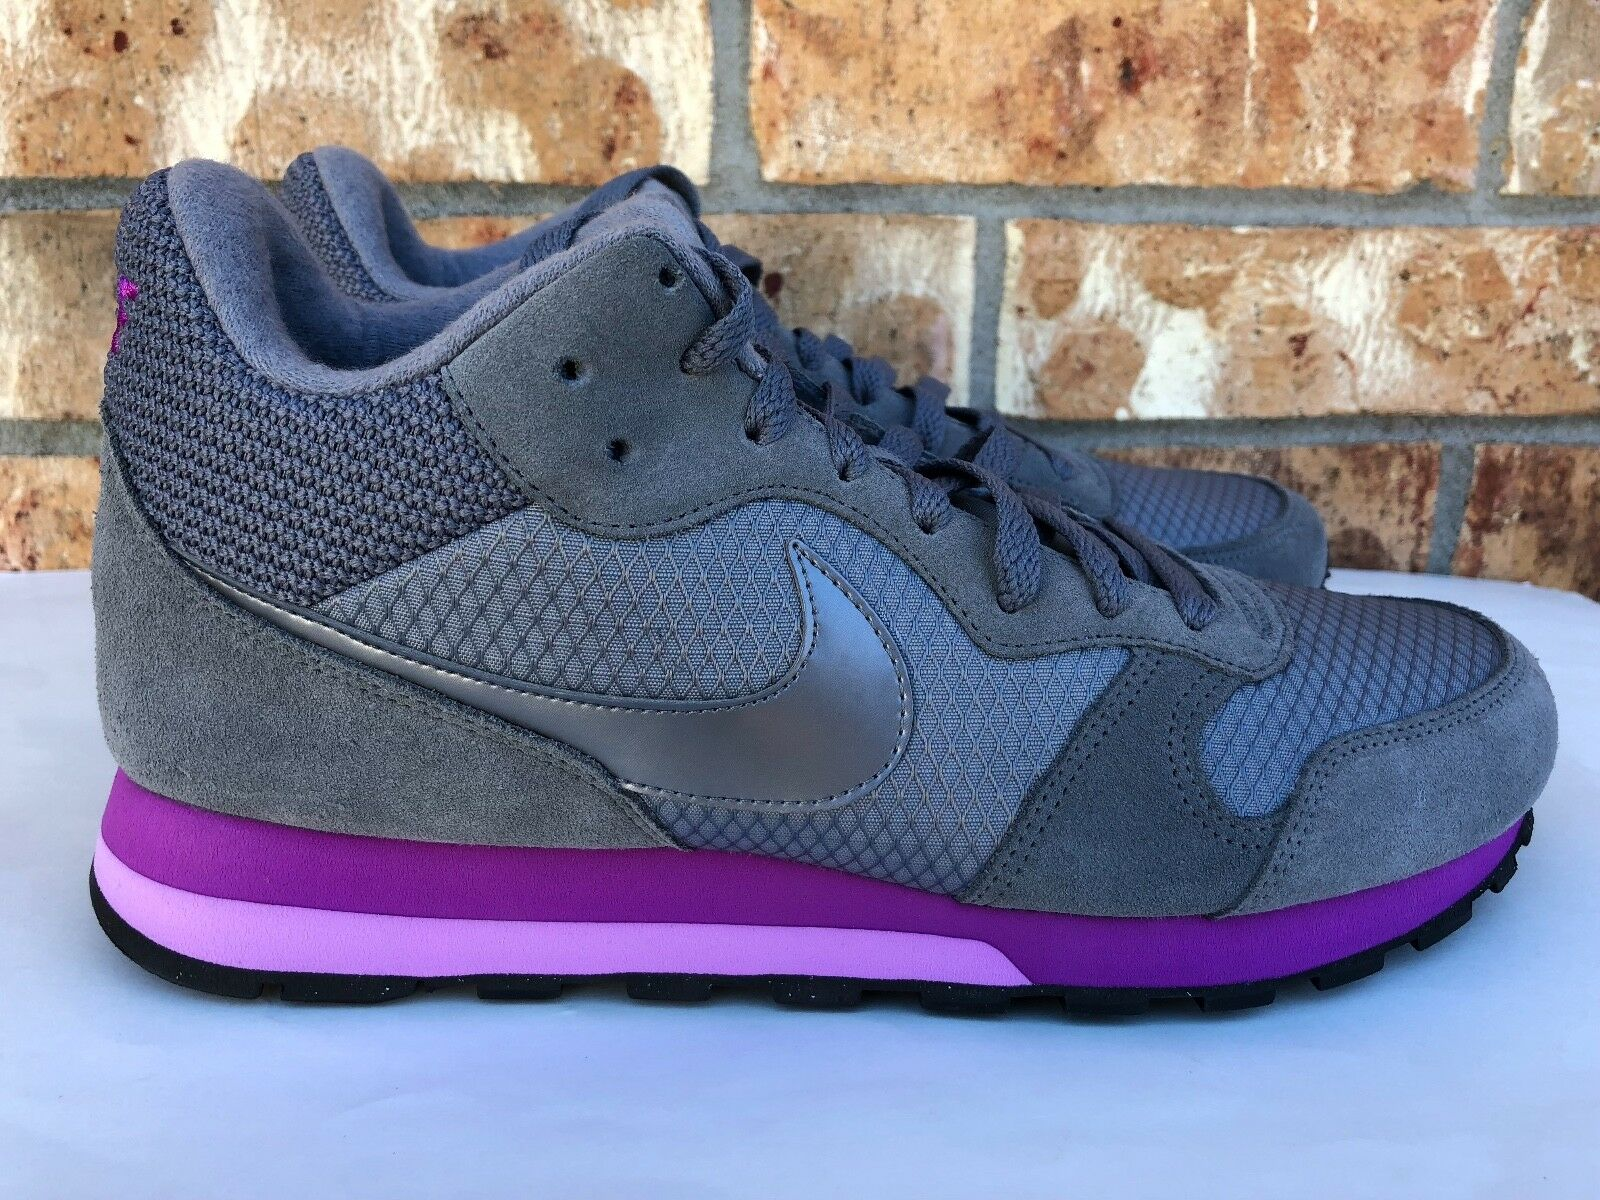 Women's Nike MD 2 Running Shoes Grey Purple Silver Black Size 10 807172-005